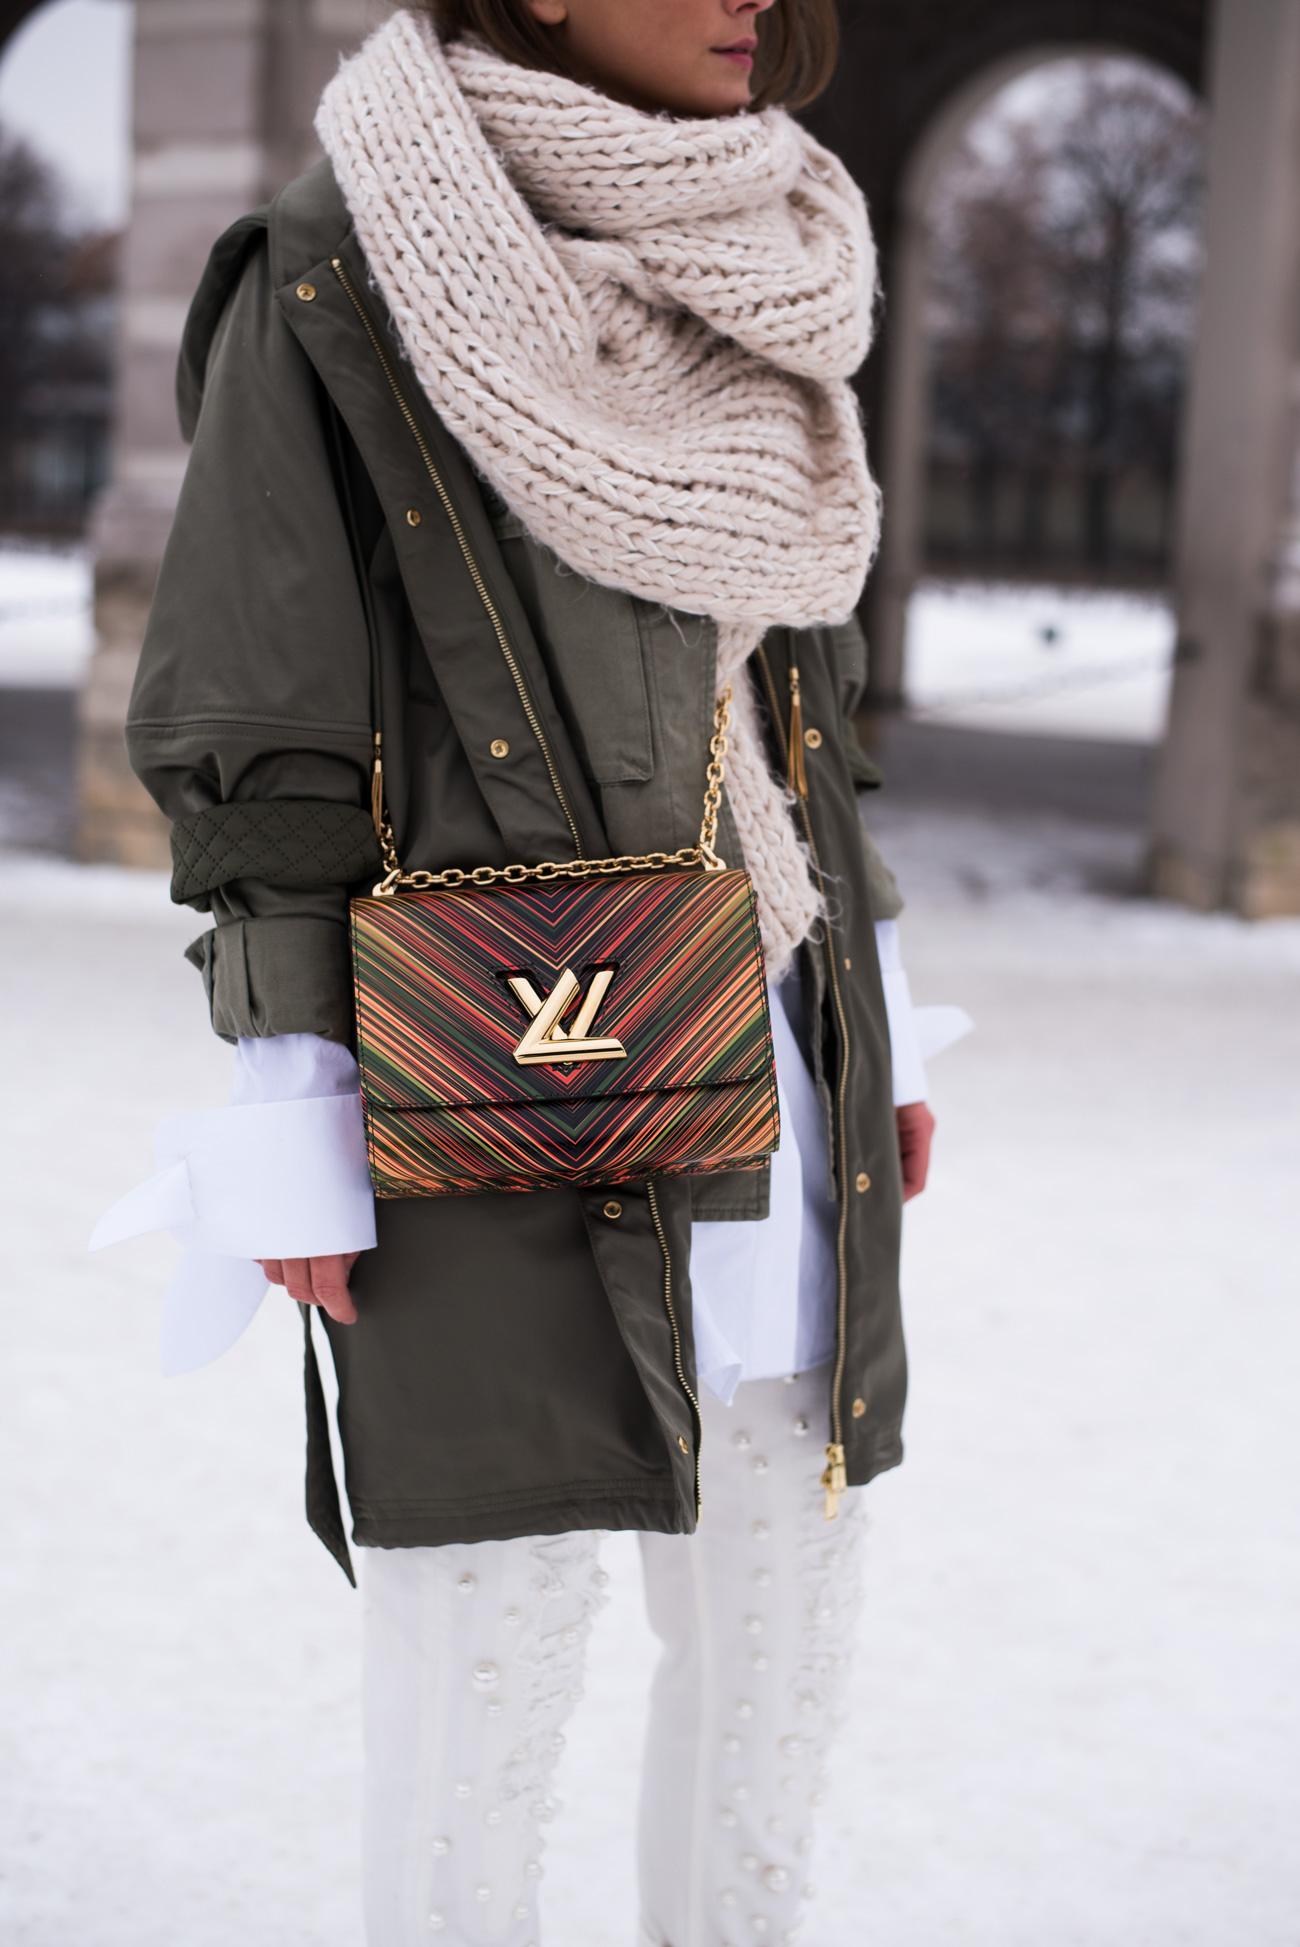 louis-vuitton-rainbow-twist-bag-cruise-collection-2016-blogger-streetstyle-fashiioncarpet